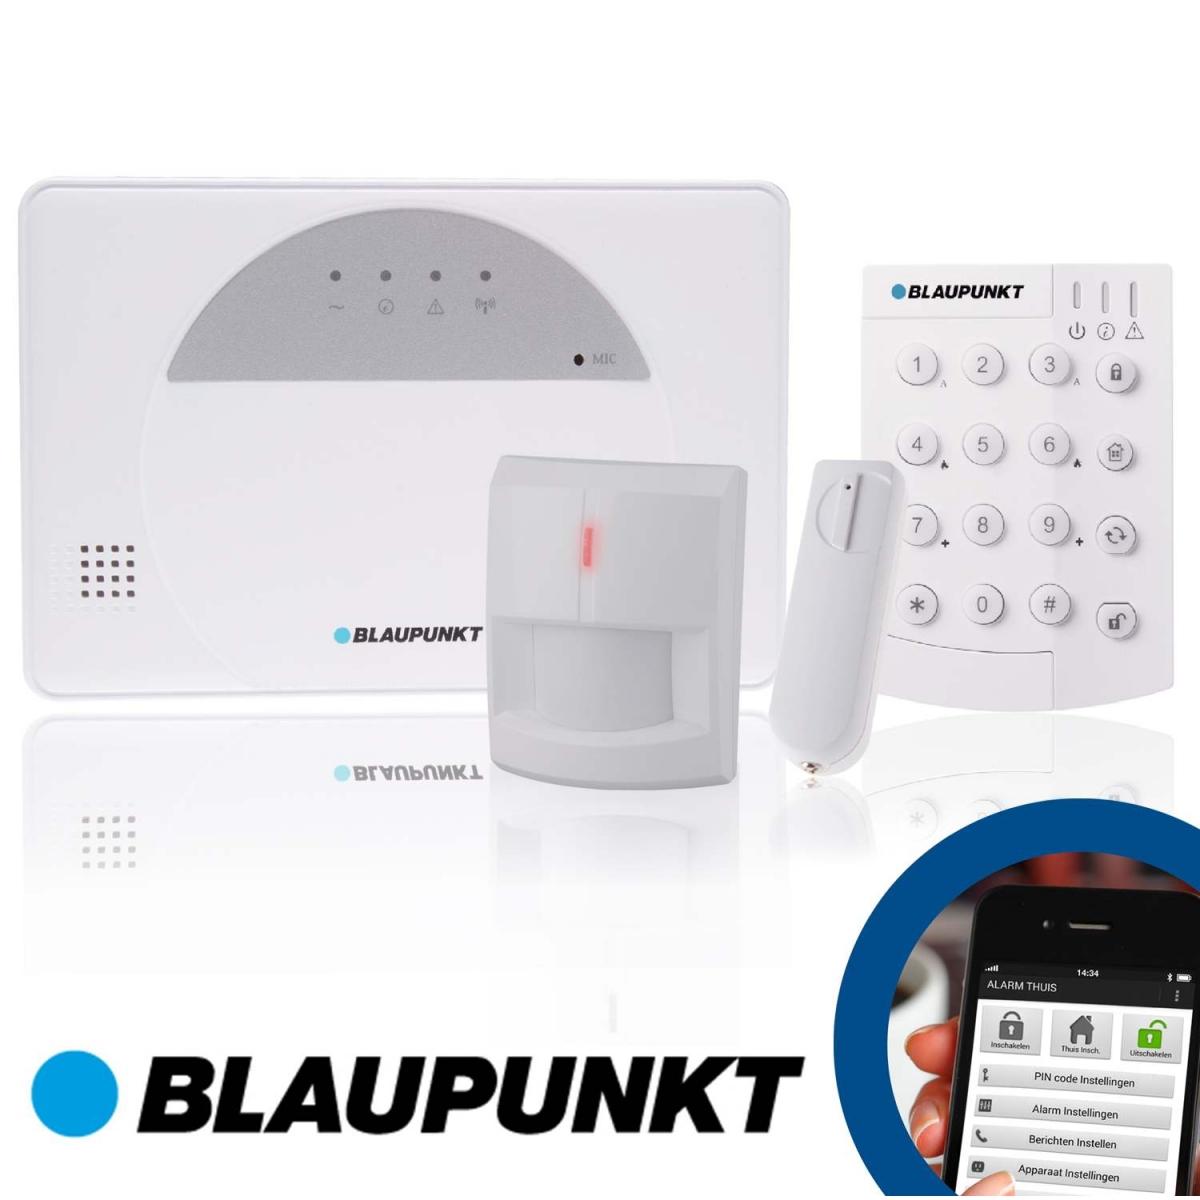 Blaupunkt SA 2650 Smart GSM Draadloos Alarmsysteem